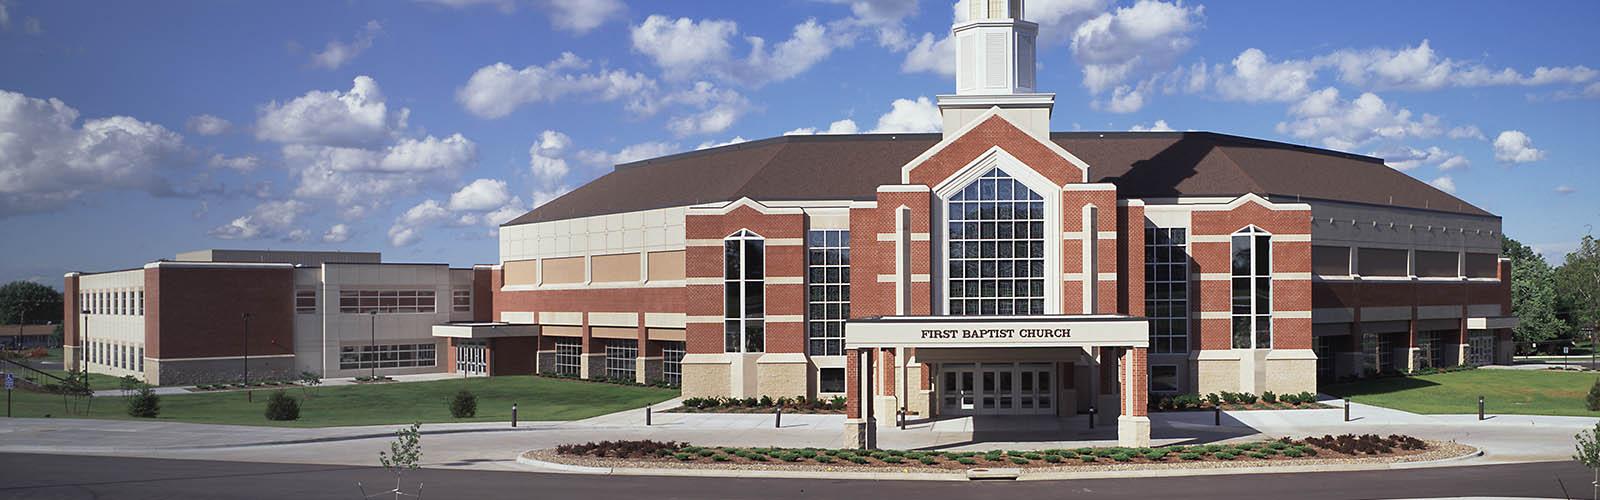 First Baptist Church of Raytown 1